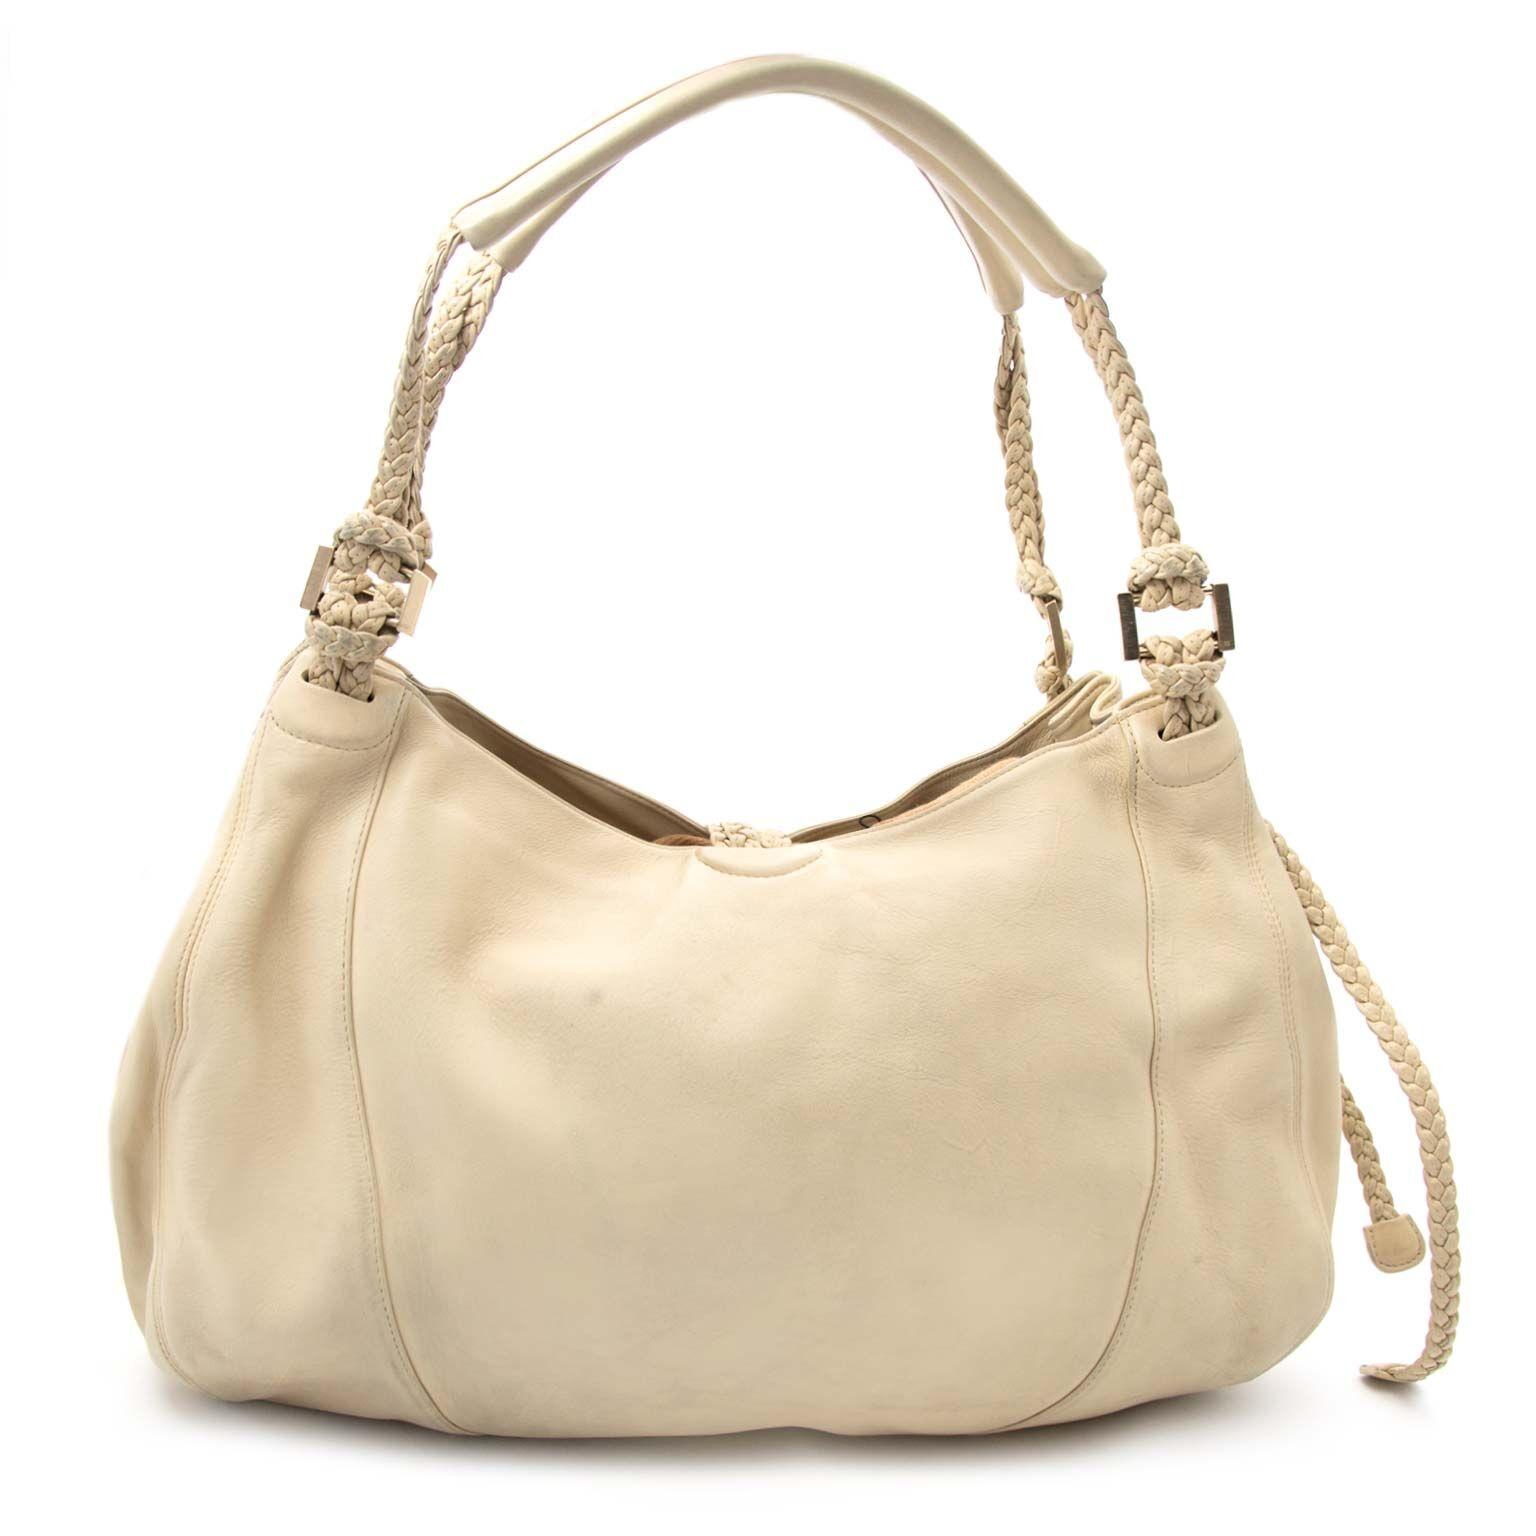 buy Delvaux Beige Eugene Bag at labellov